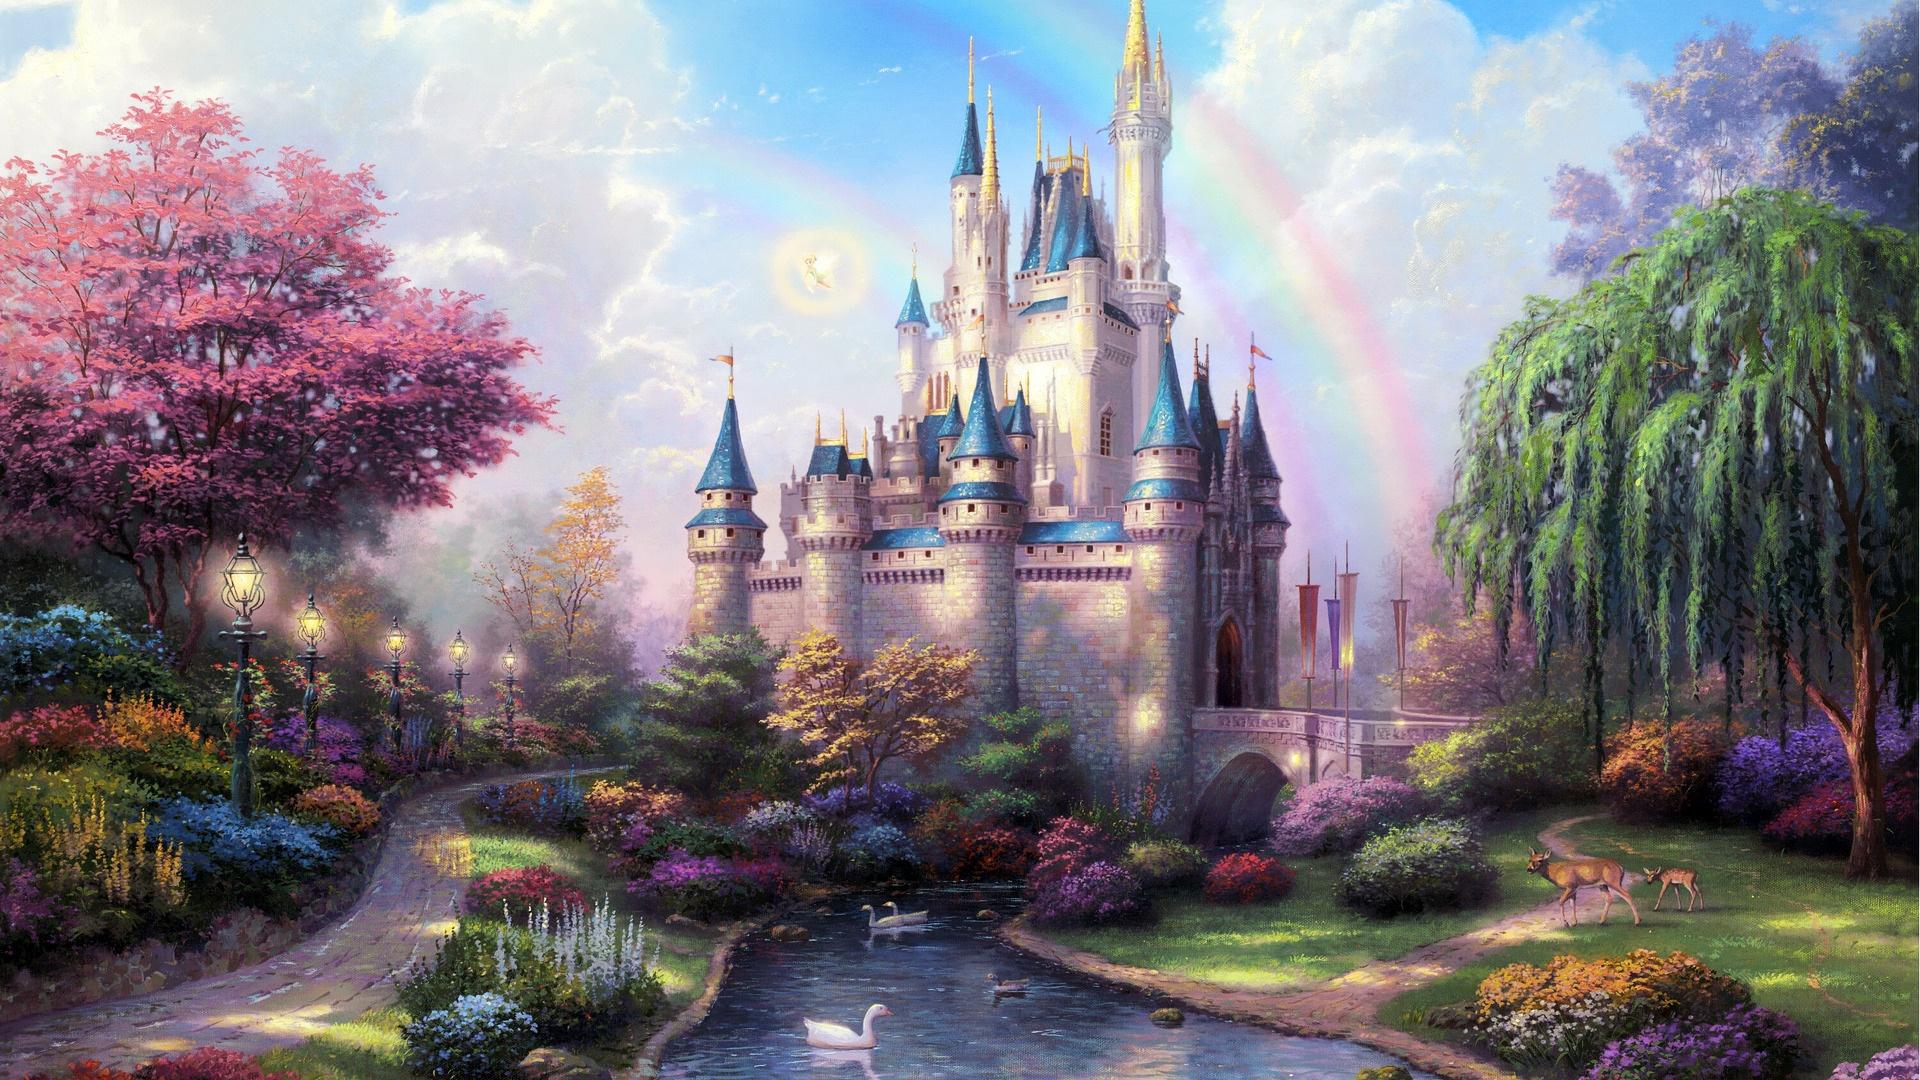 Disney desktop wallpaper free download